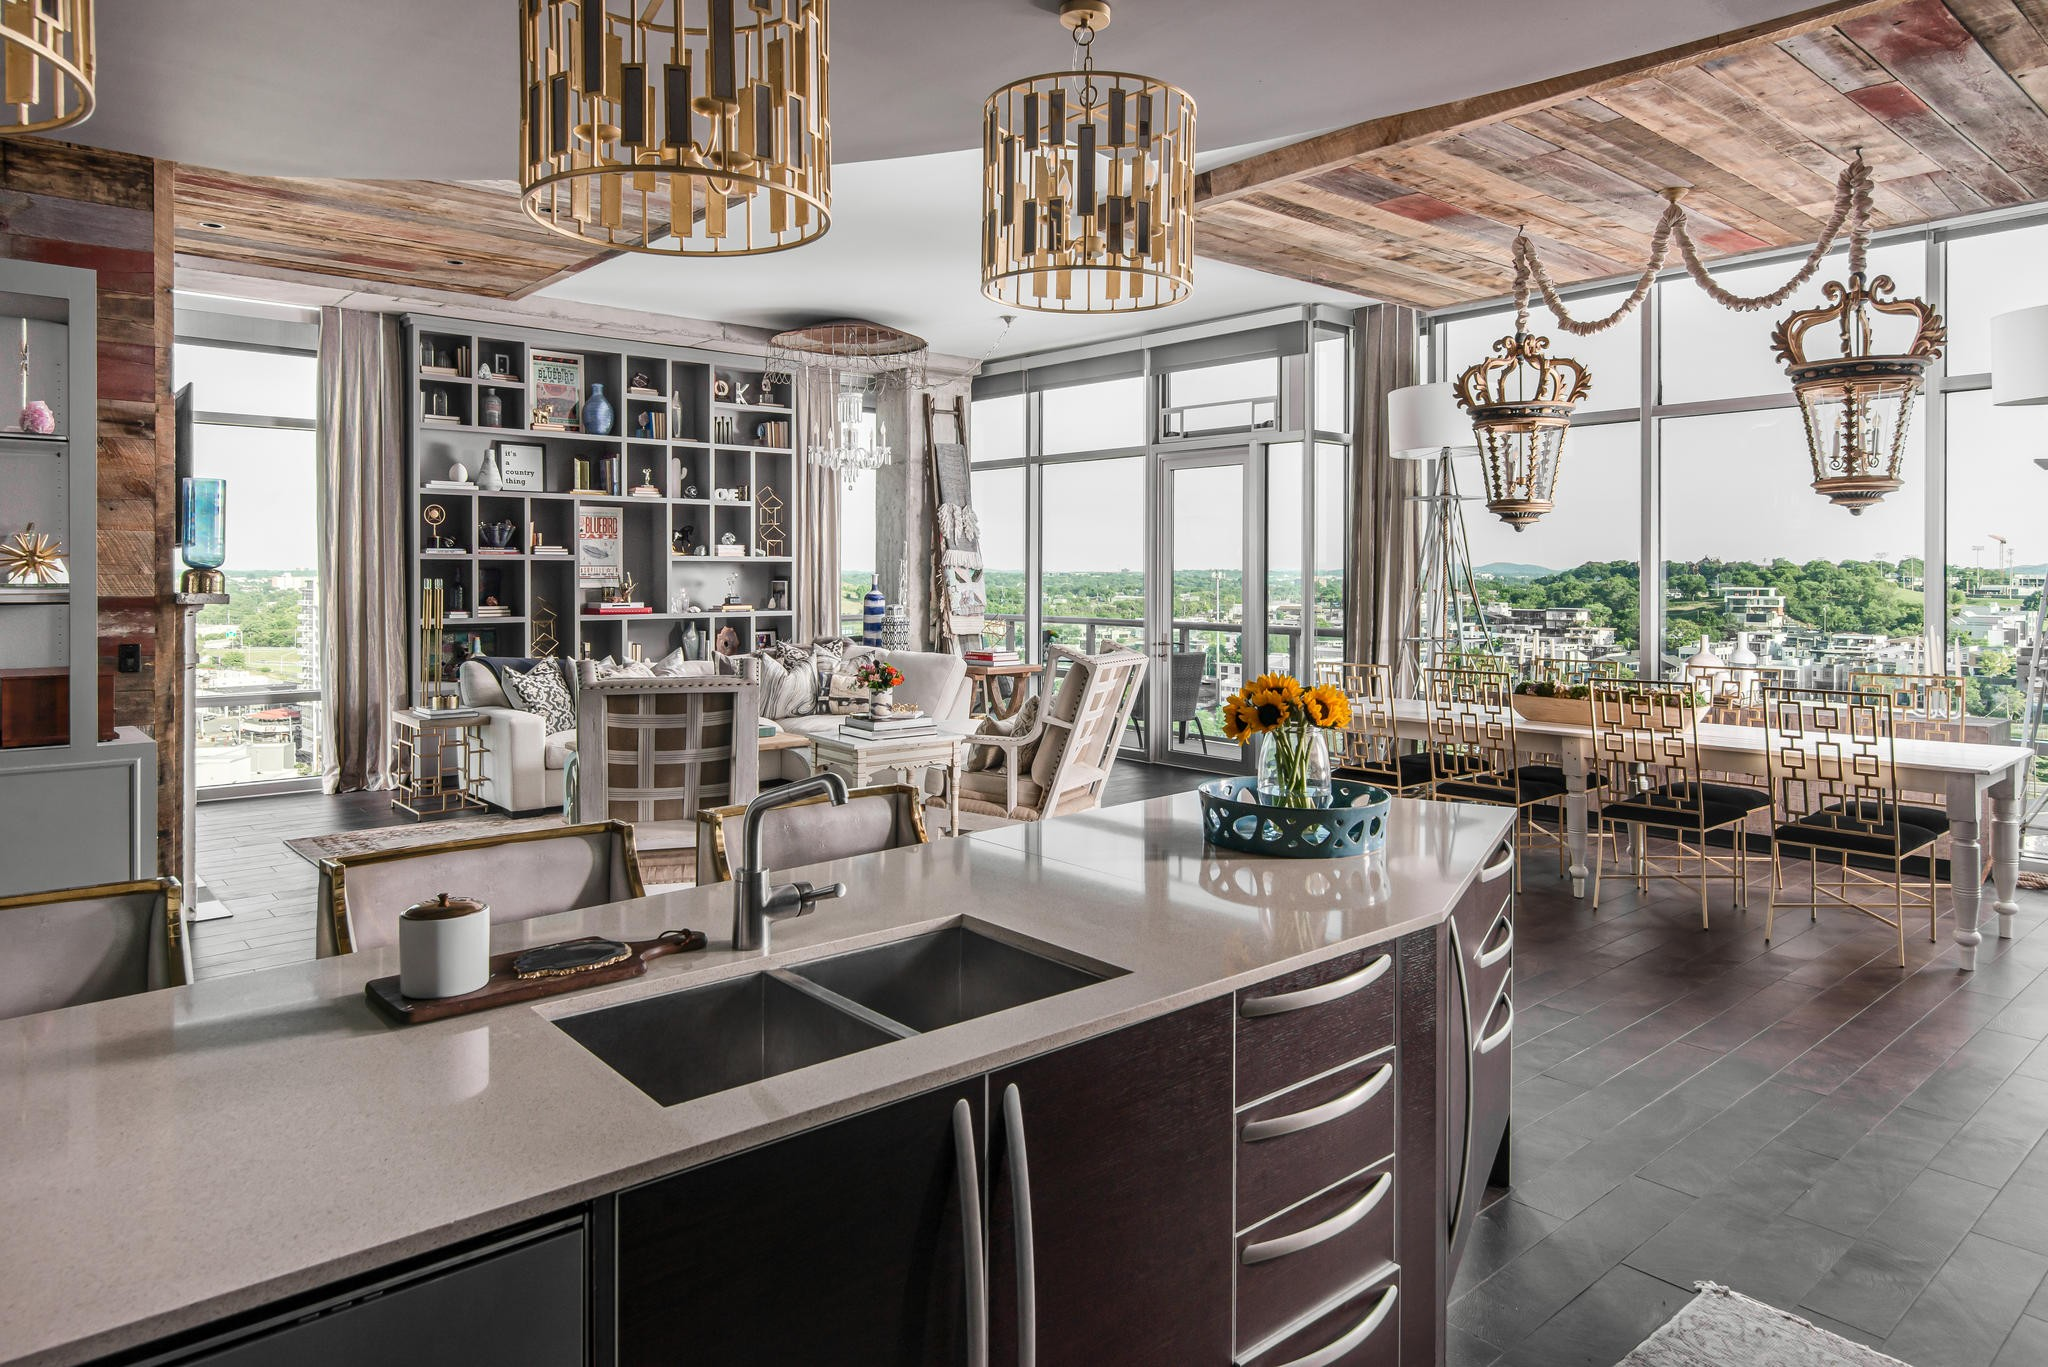 700 12th Ave, S Property Photo - Nashville, TN real estate listing